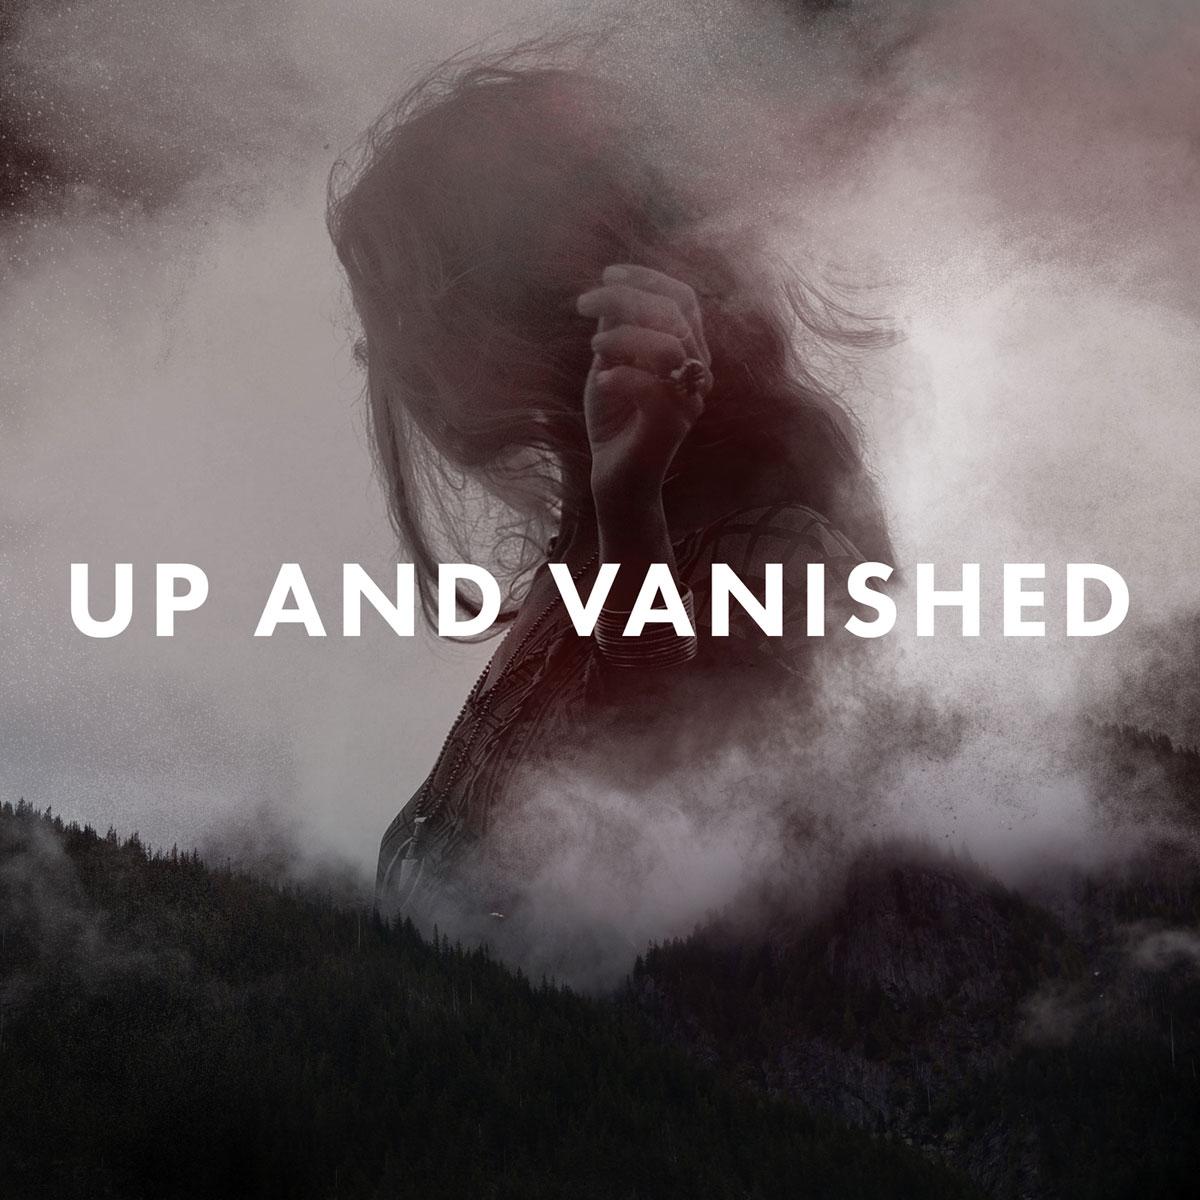 Up and Vanished Season 2